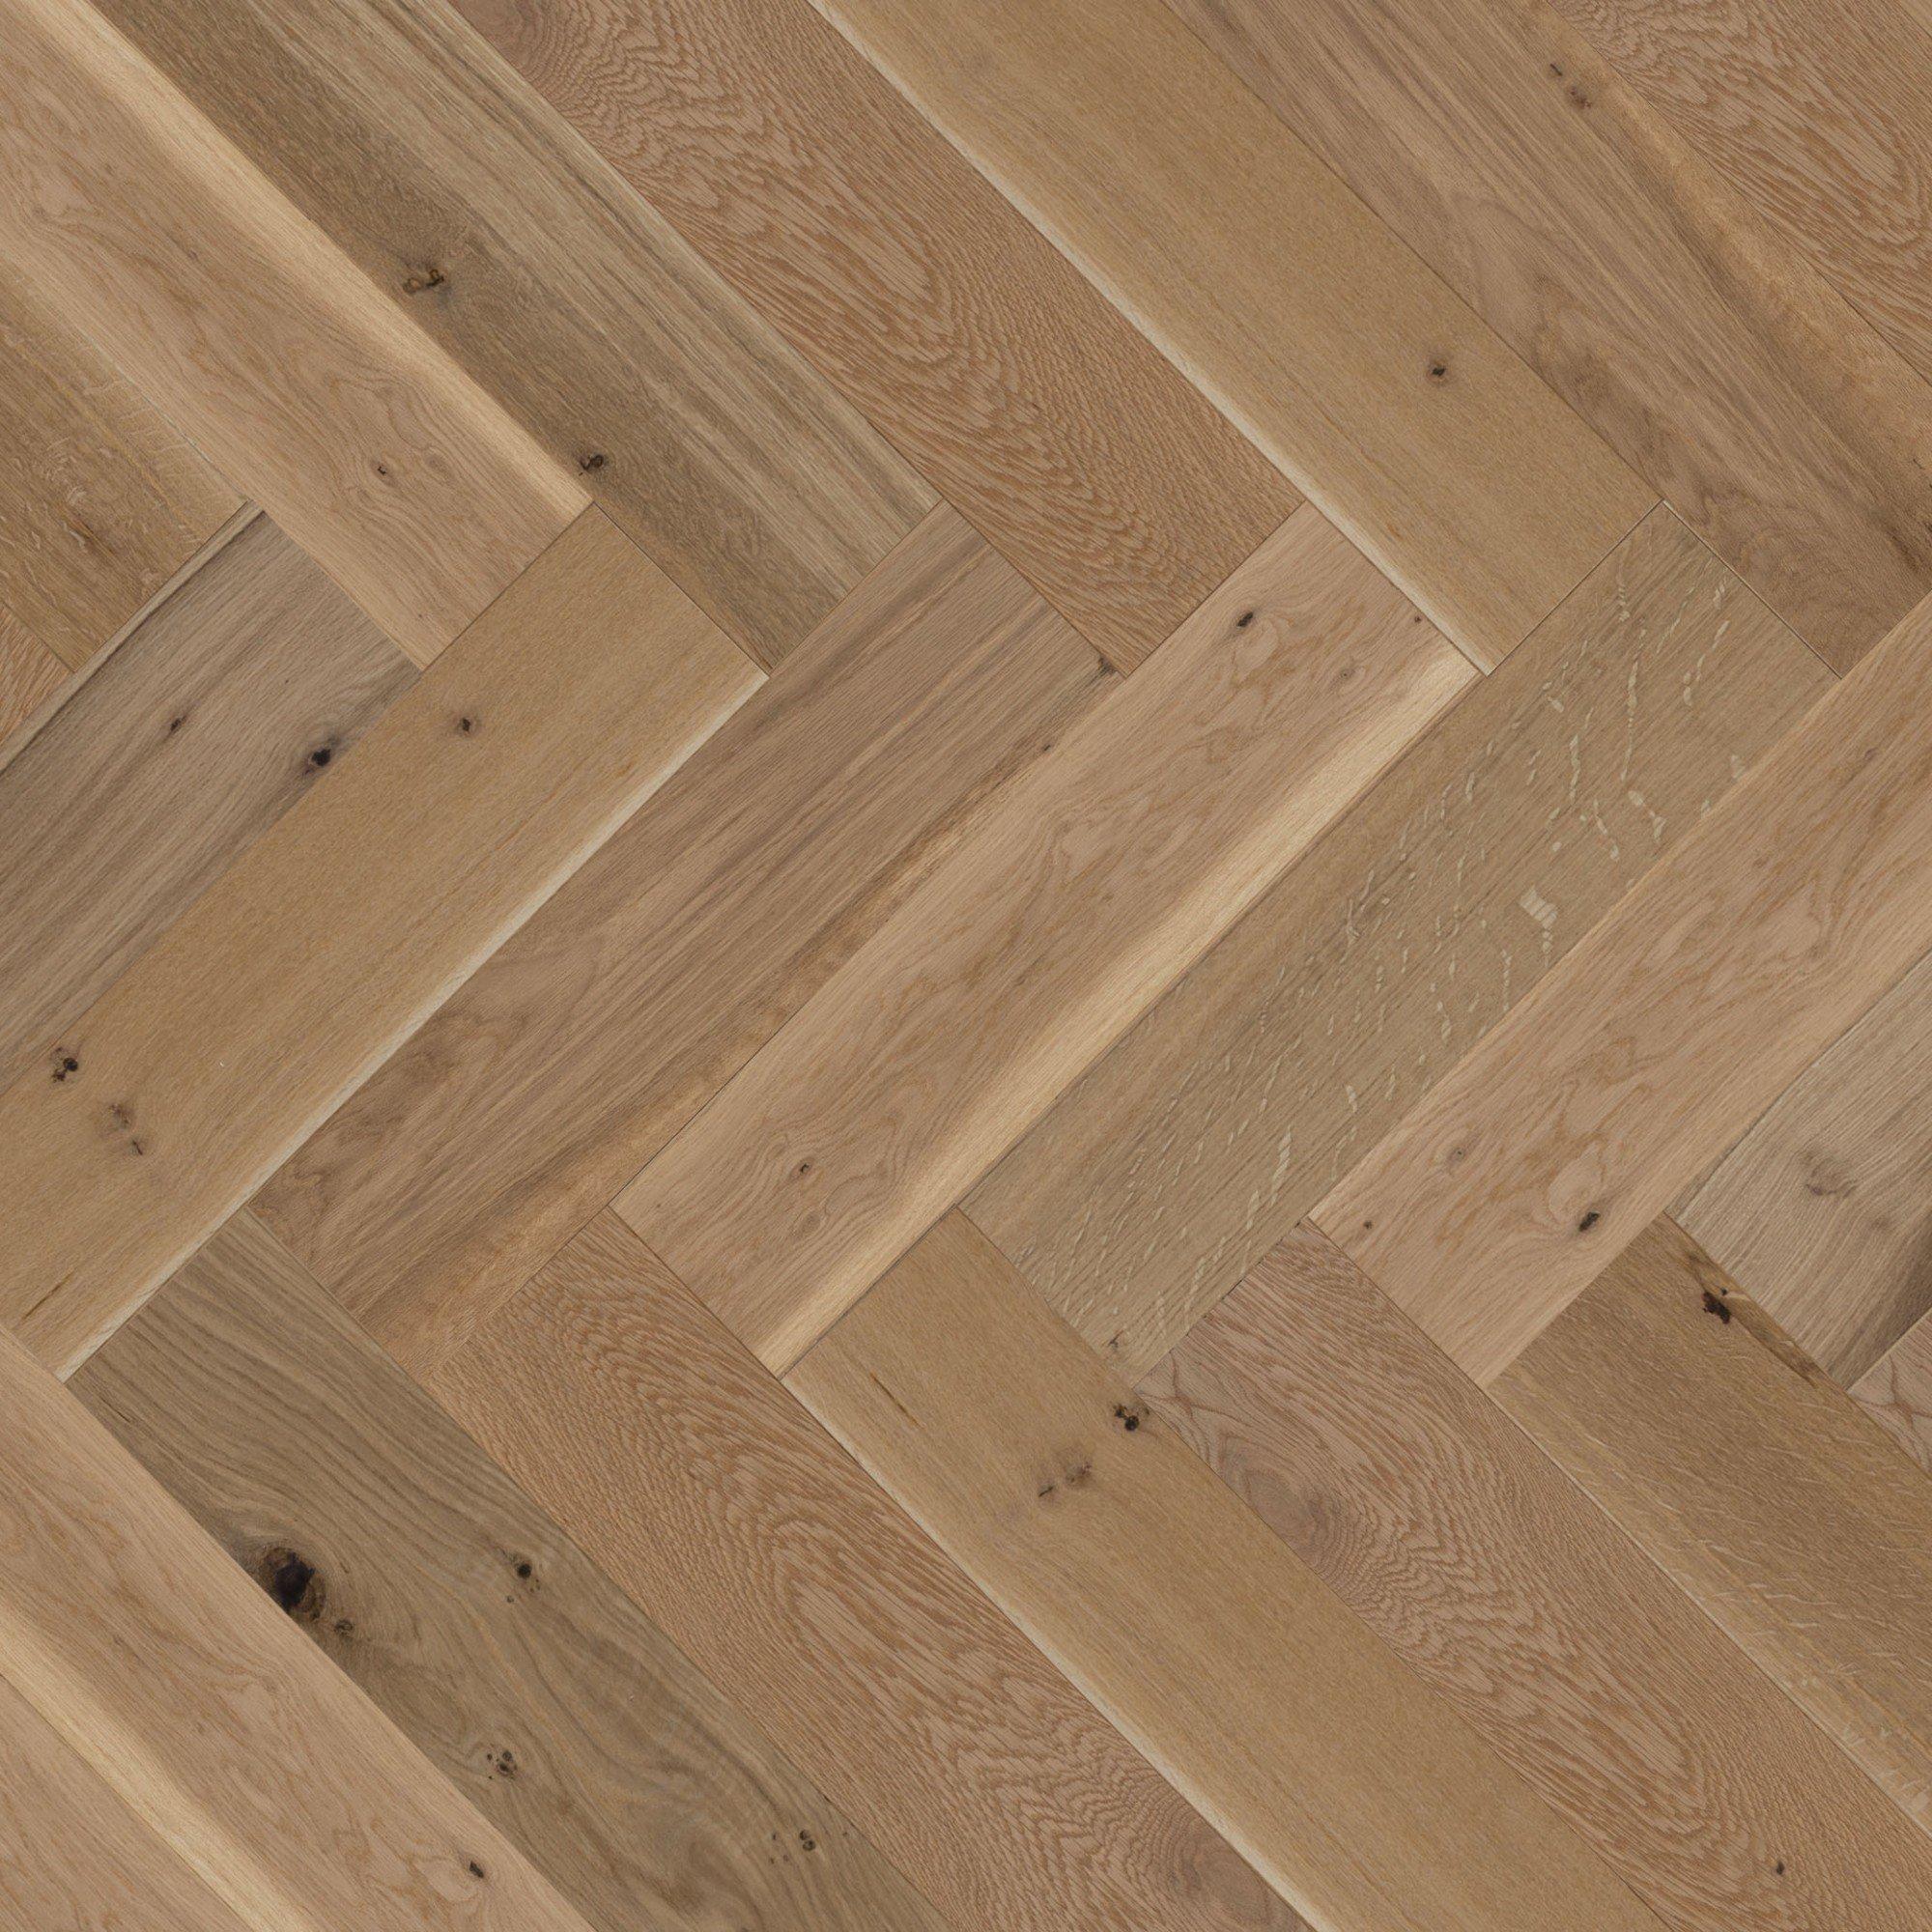 White Oak Character Brushed - Floor image